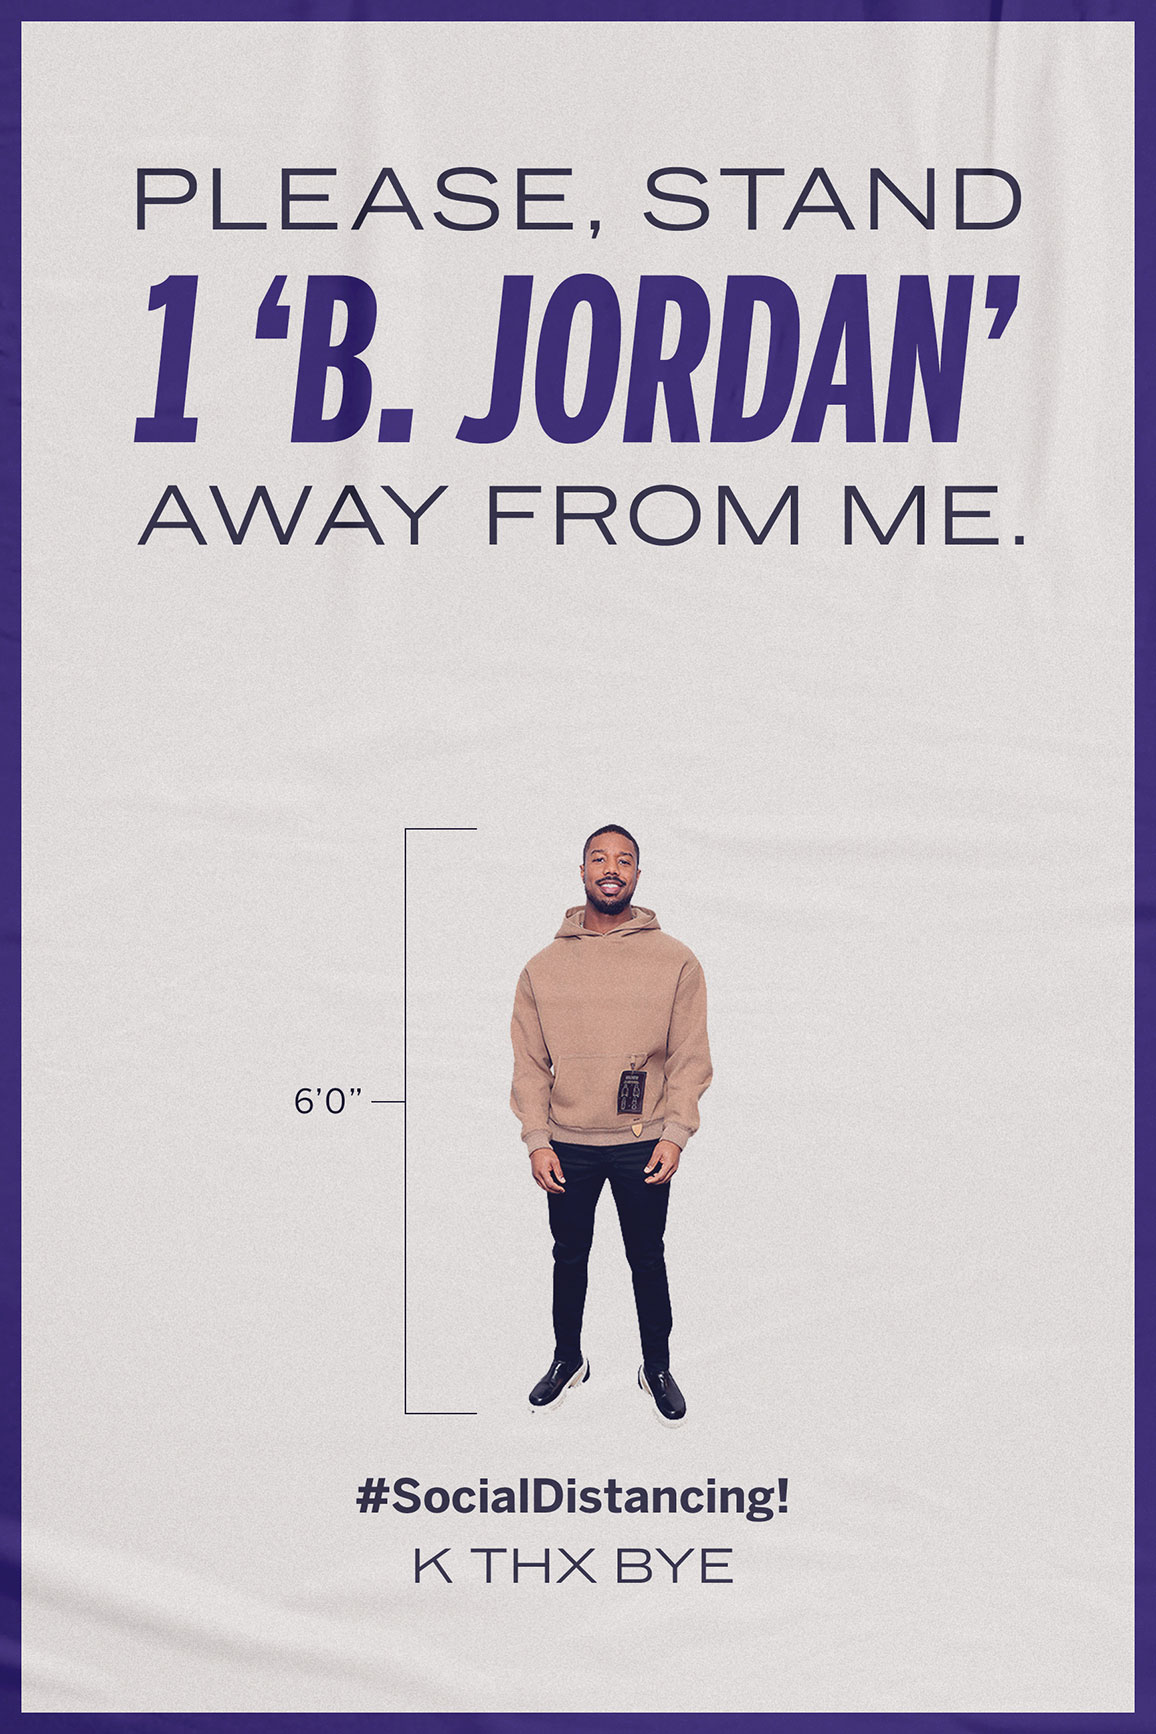 Please Stand 1 'B. Jordan' Away From Me.